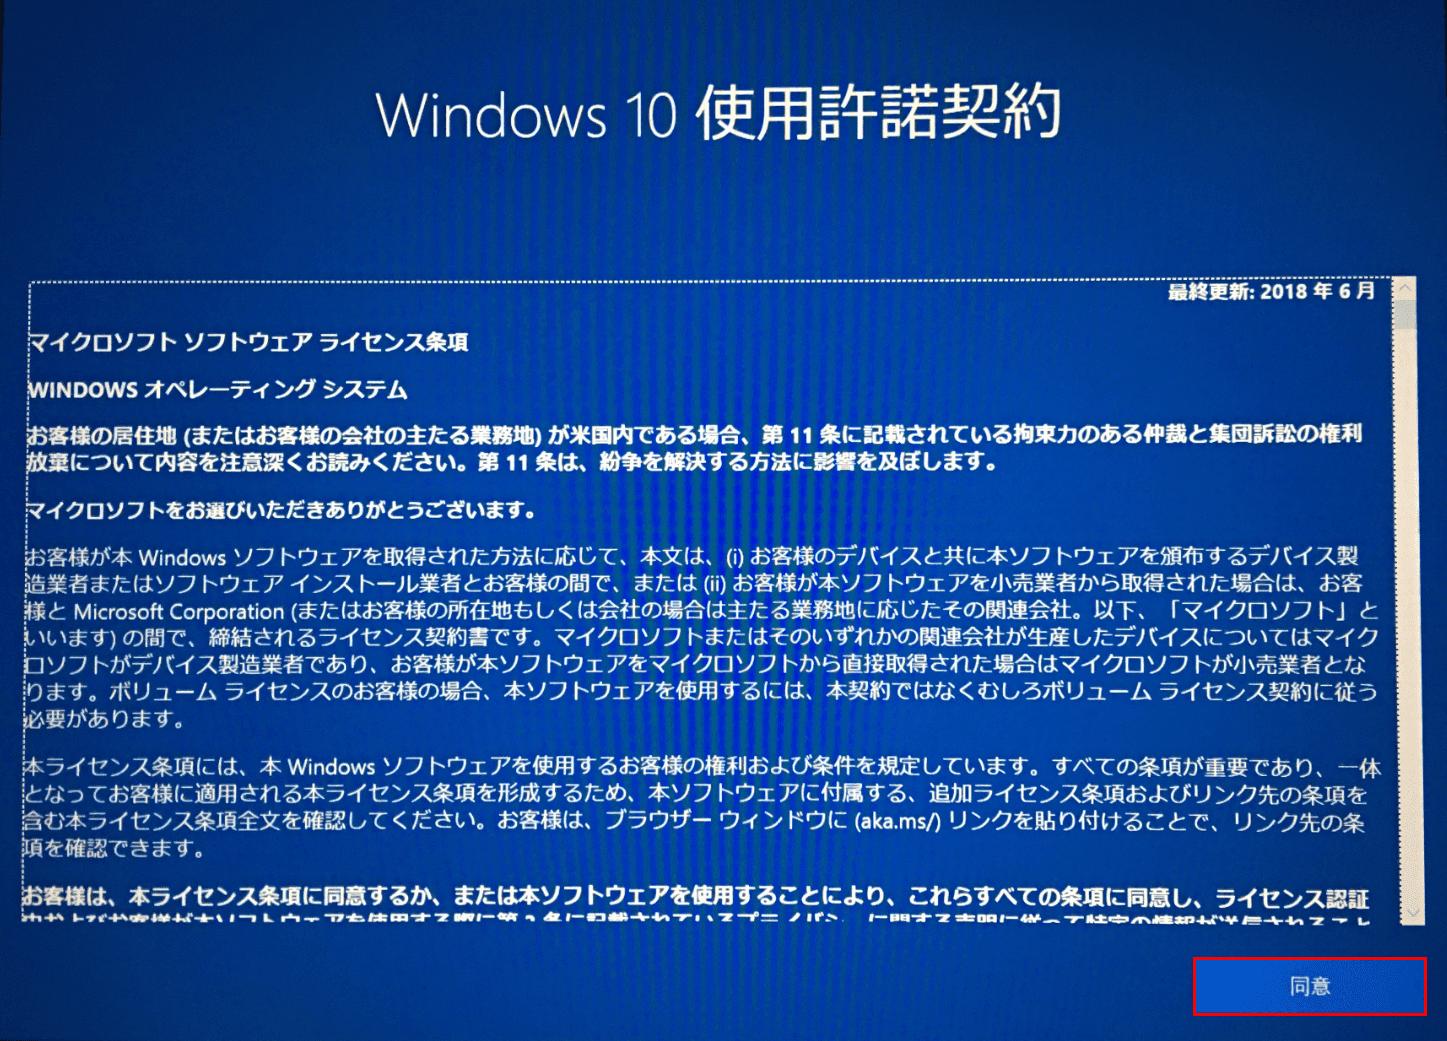 Windows10Microsoftアカウントでの初期設定、Windows10使用許諾契約